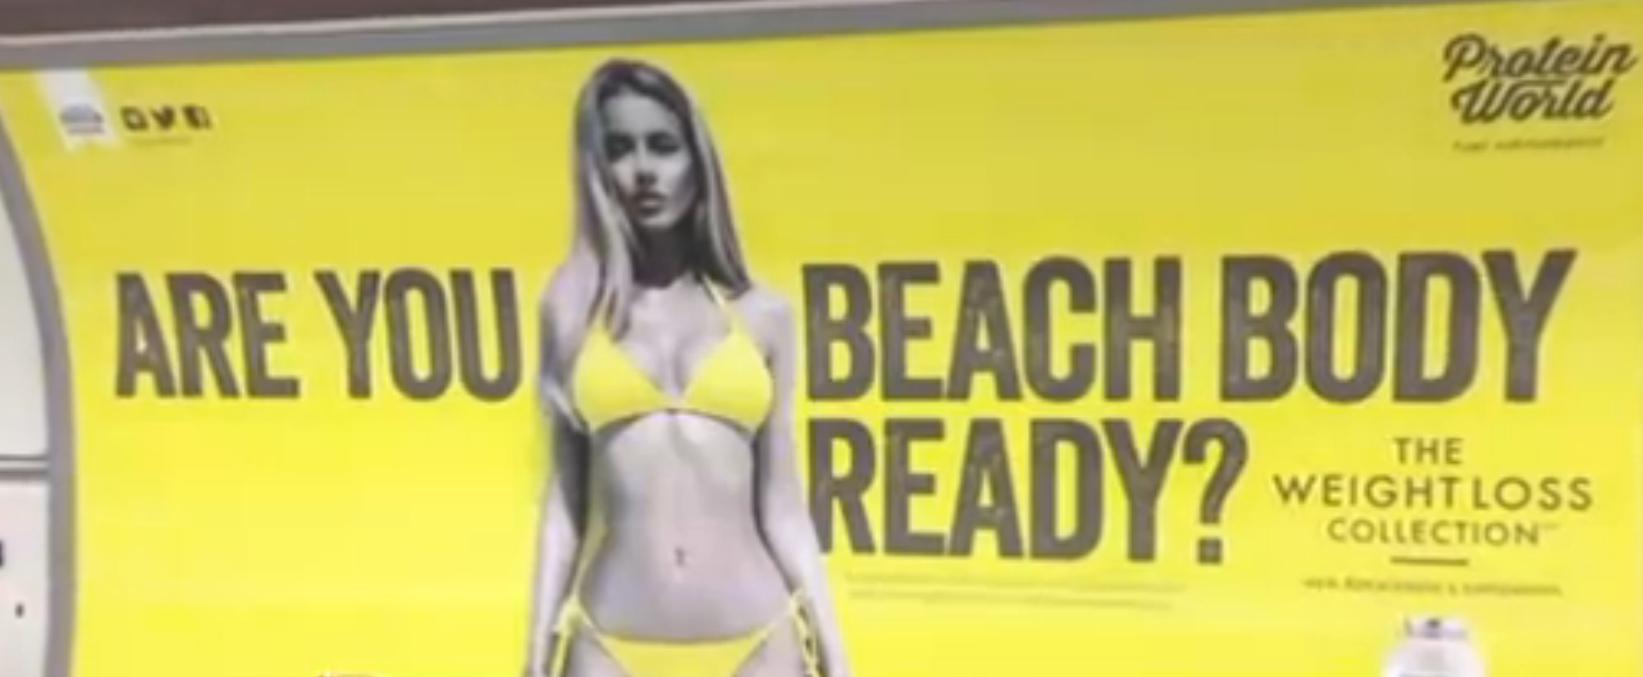 Are_You_Beach_Body_Ready